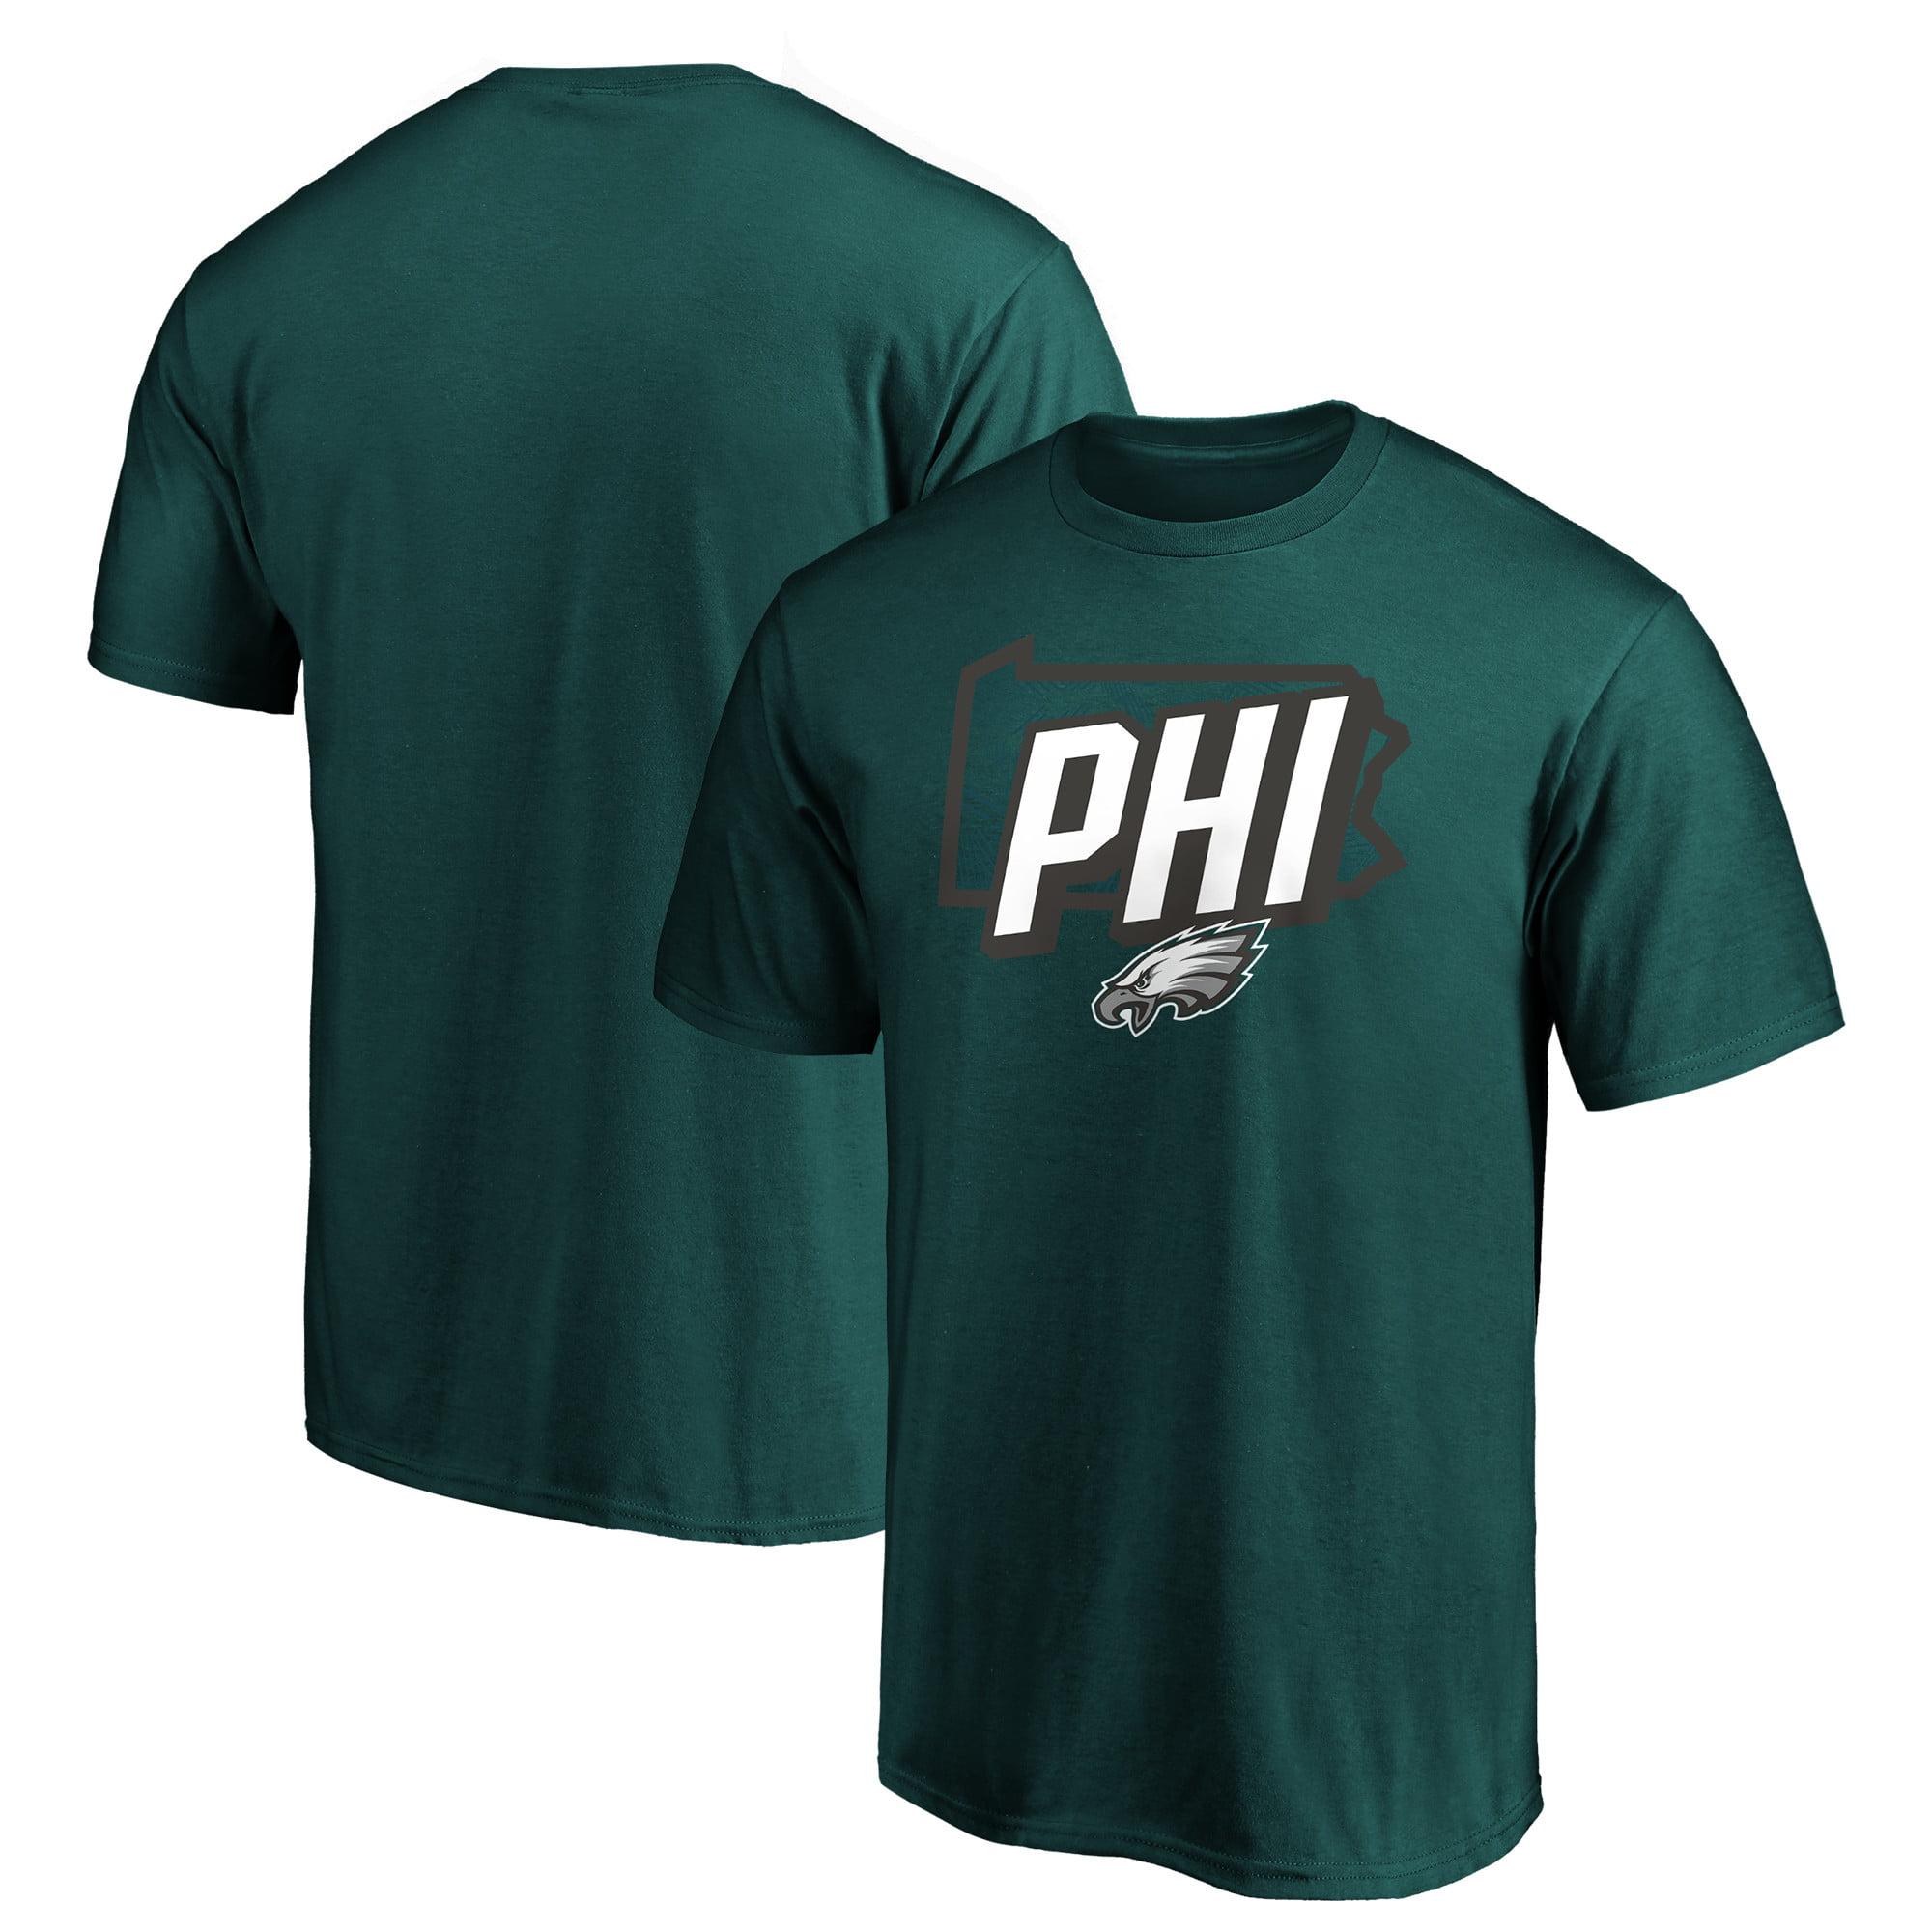 low priced 4723e aad07 Philadelphia Eagles Team Shop - Walmart.com